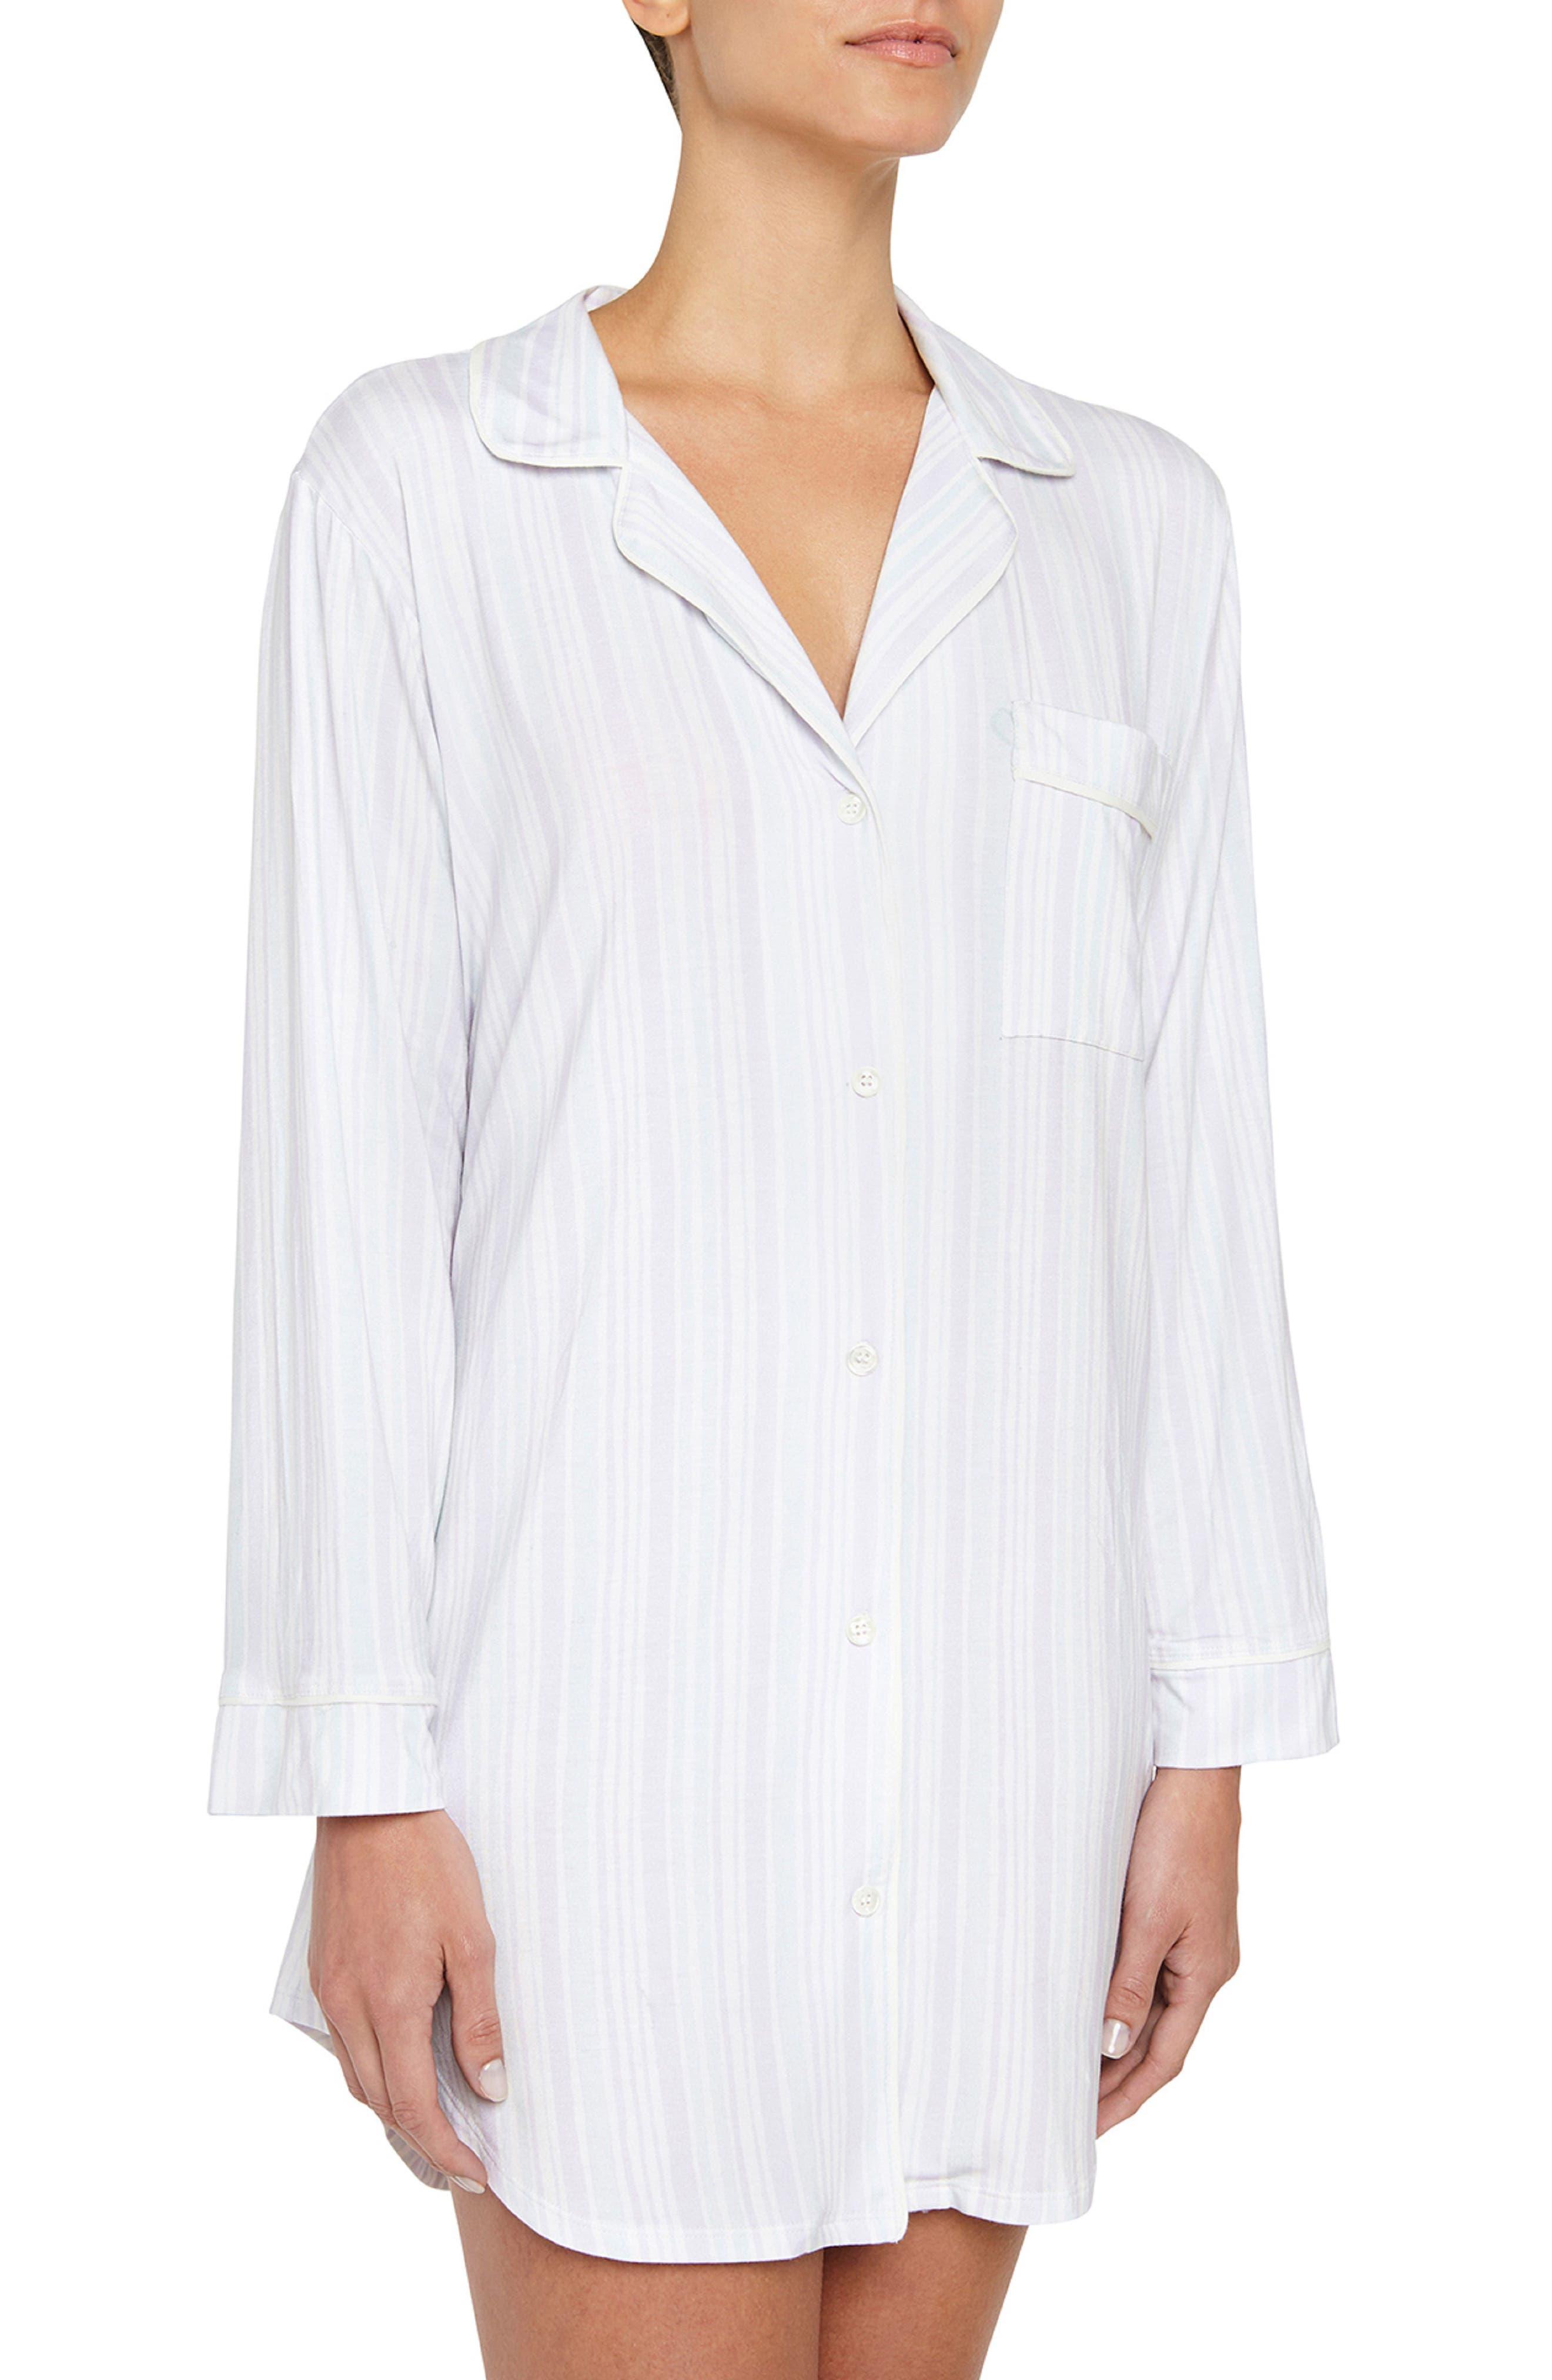 Painted Stripes Sleep Shirt,                         Main,                         color, 500